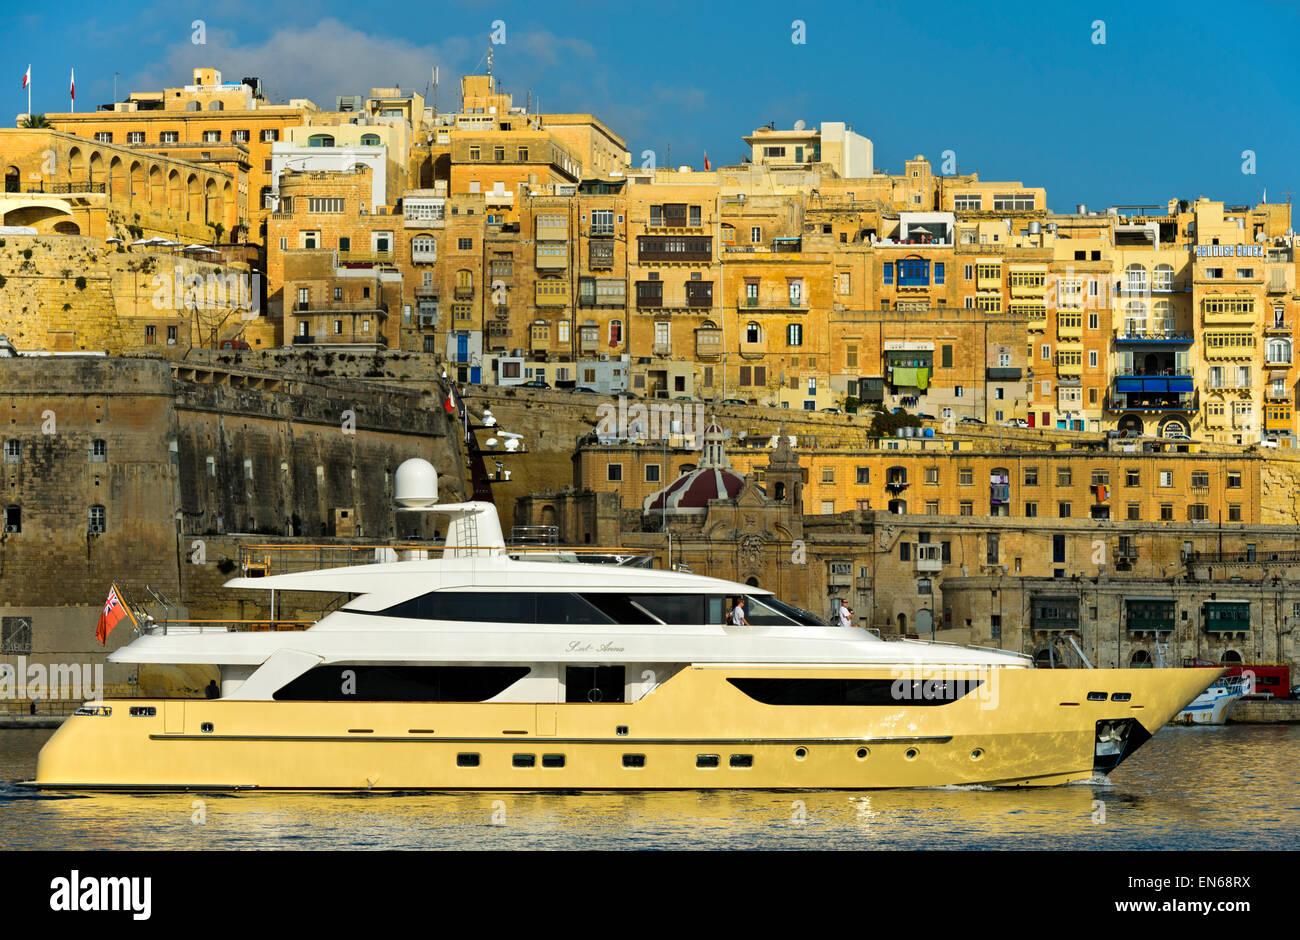 Superyacht Santa Anna in the Grand Harbour area against the scenic background of Valletta, Malta - Stock Image